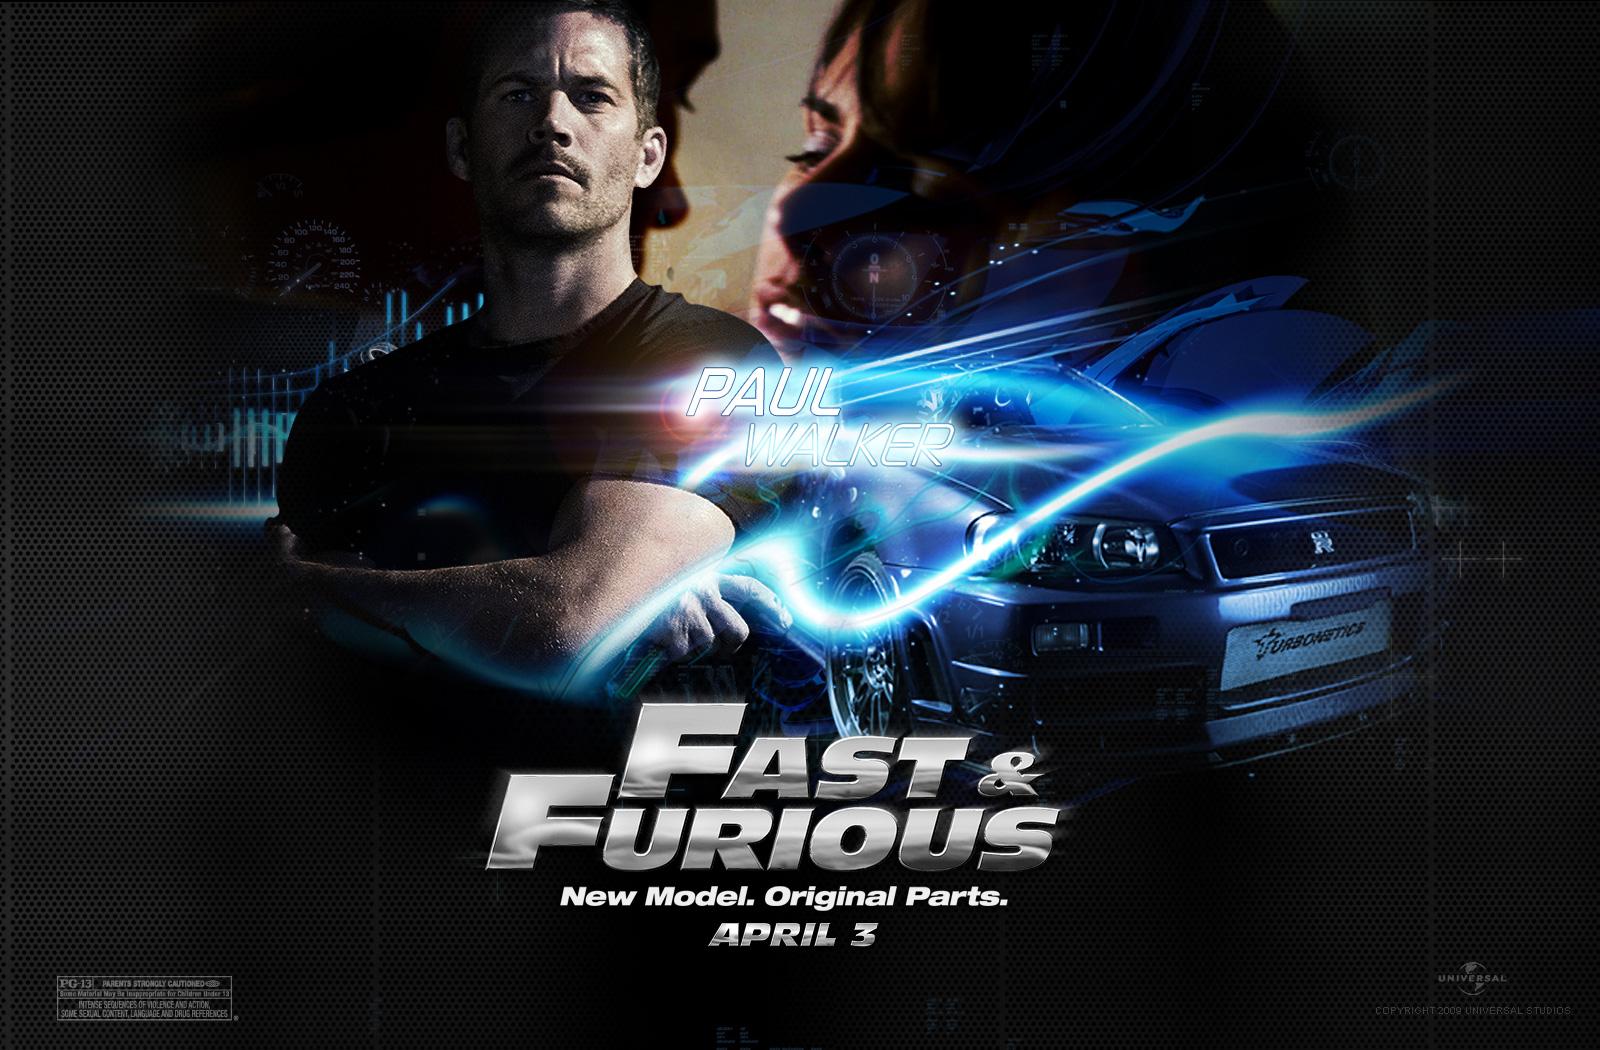 [45+] Paul Walker Wallpaper HD on WallpaperSafari |Fast And Furious 6 Paul Walker Wallpaper